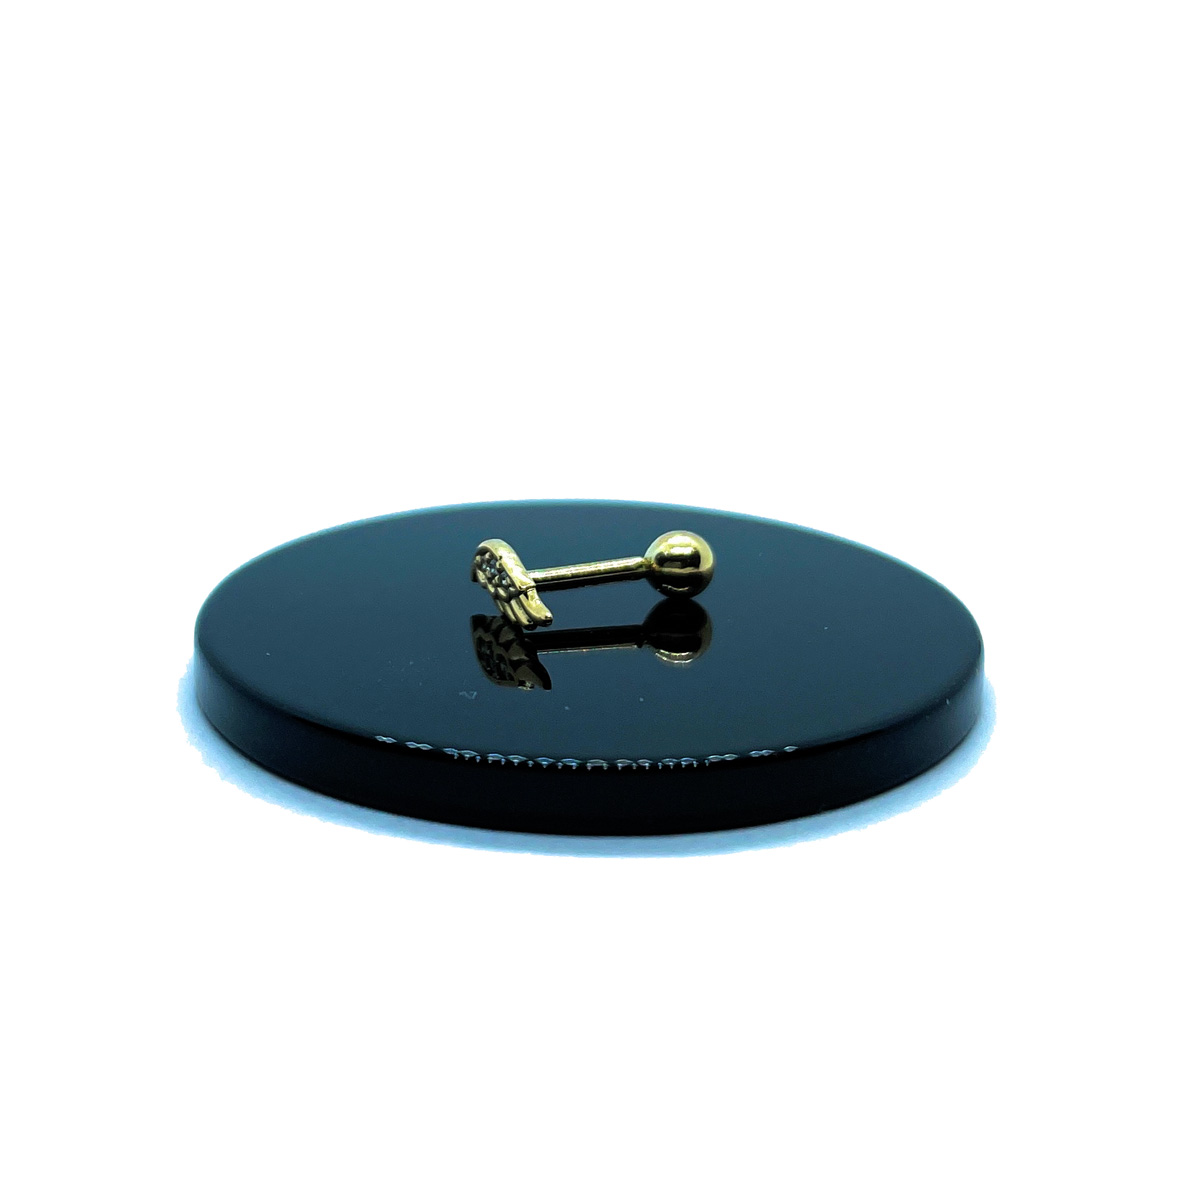 Piercing Helix Mini Asa De Anjo Brilhante De Zircônia Ouro 18K 25713 K040